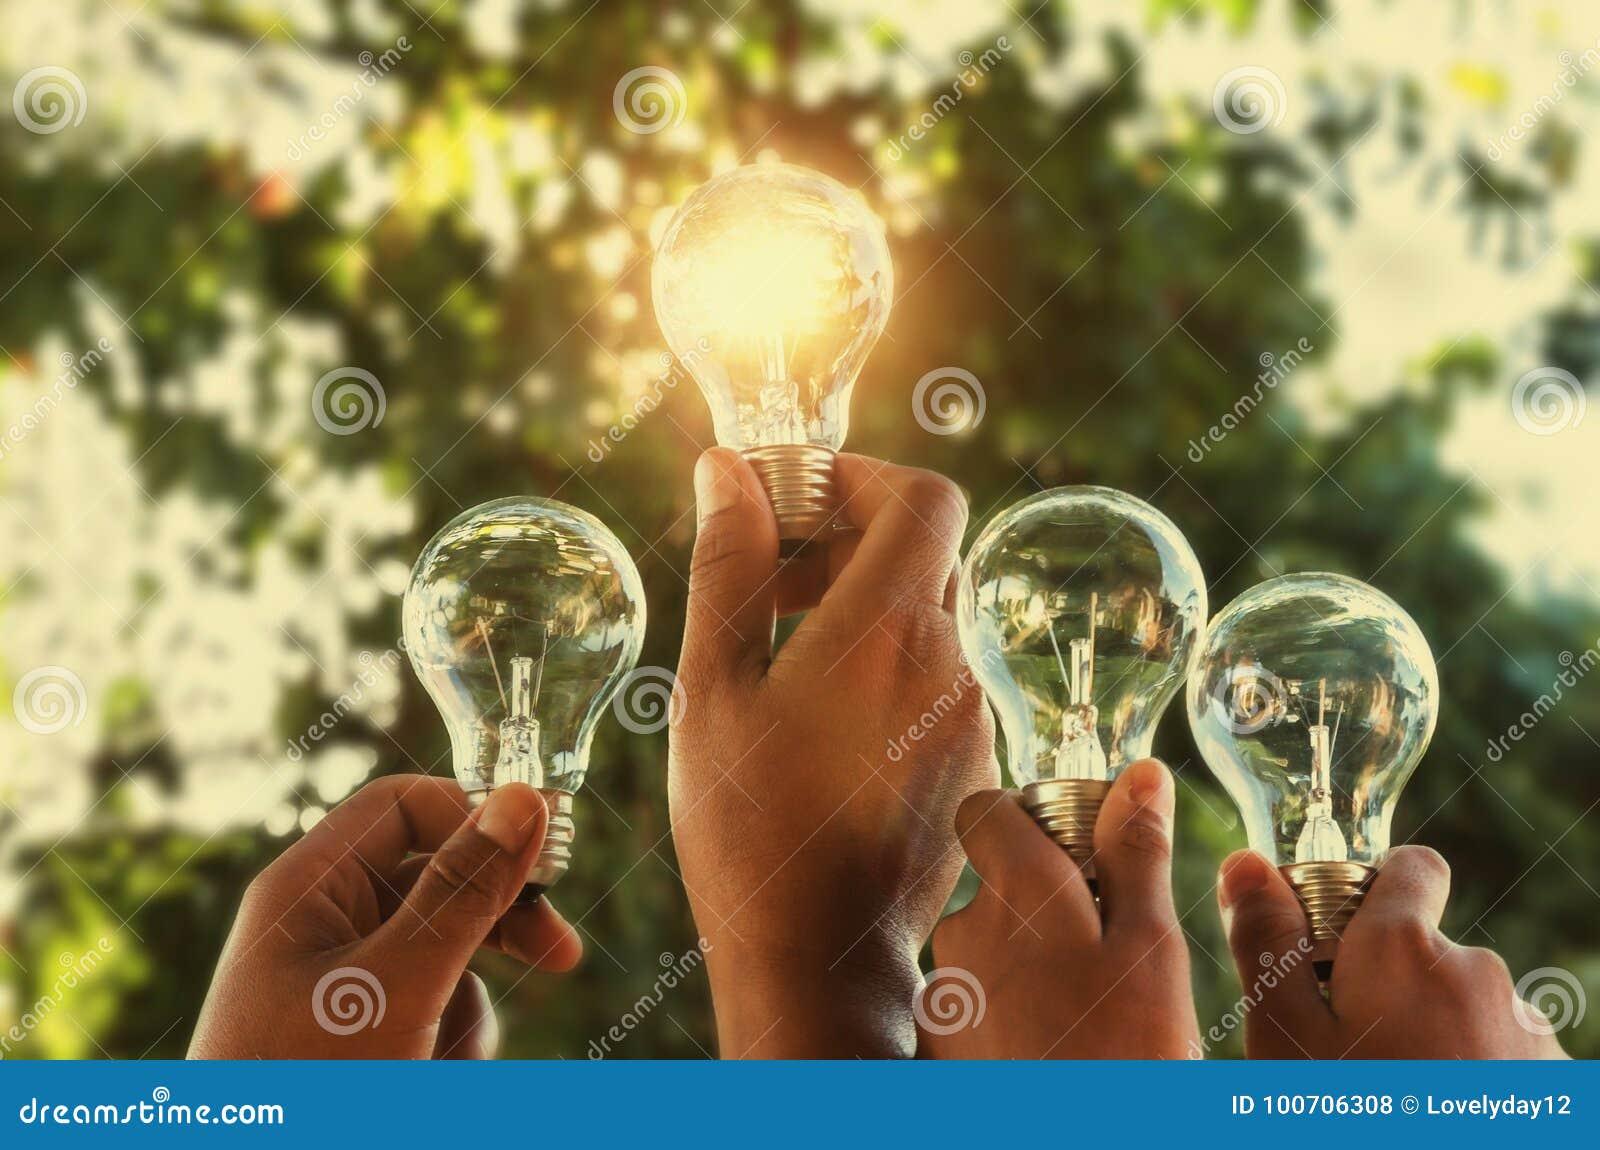 solar energy concept hand group holding light bulb